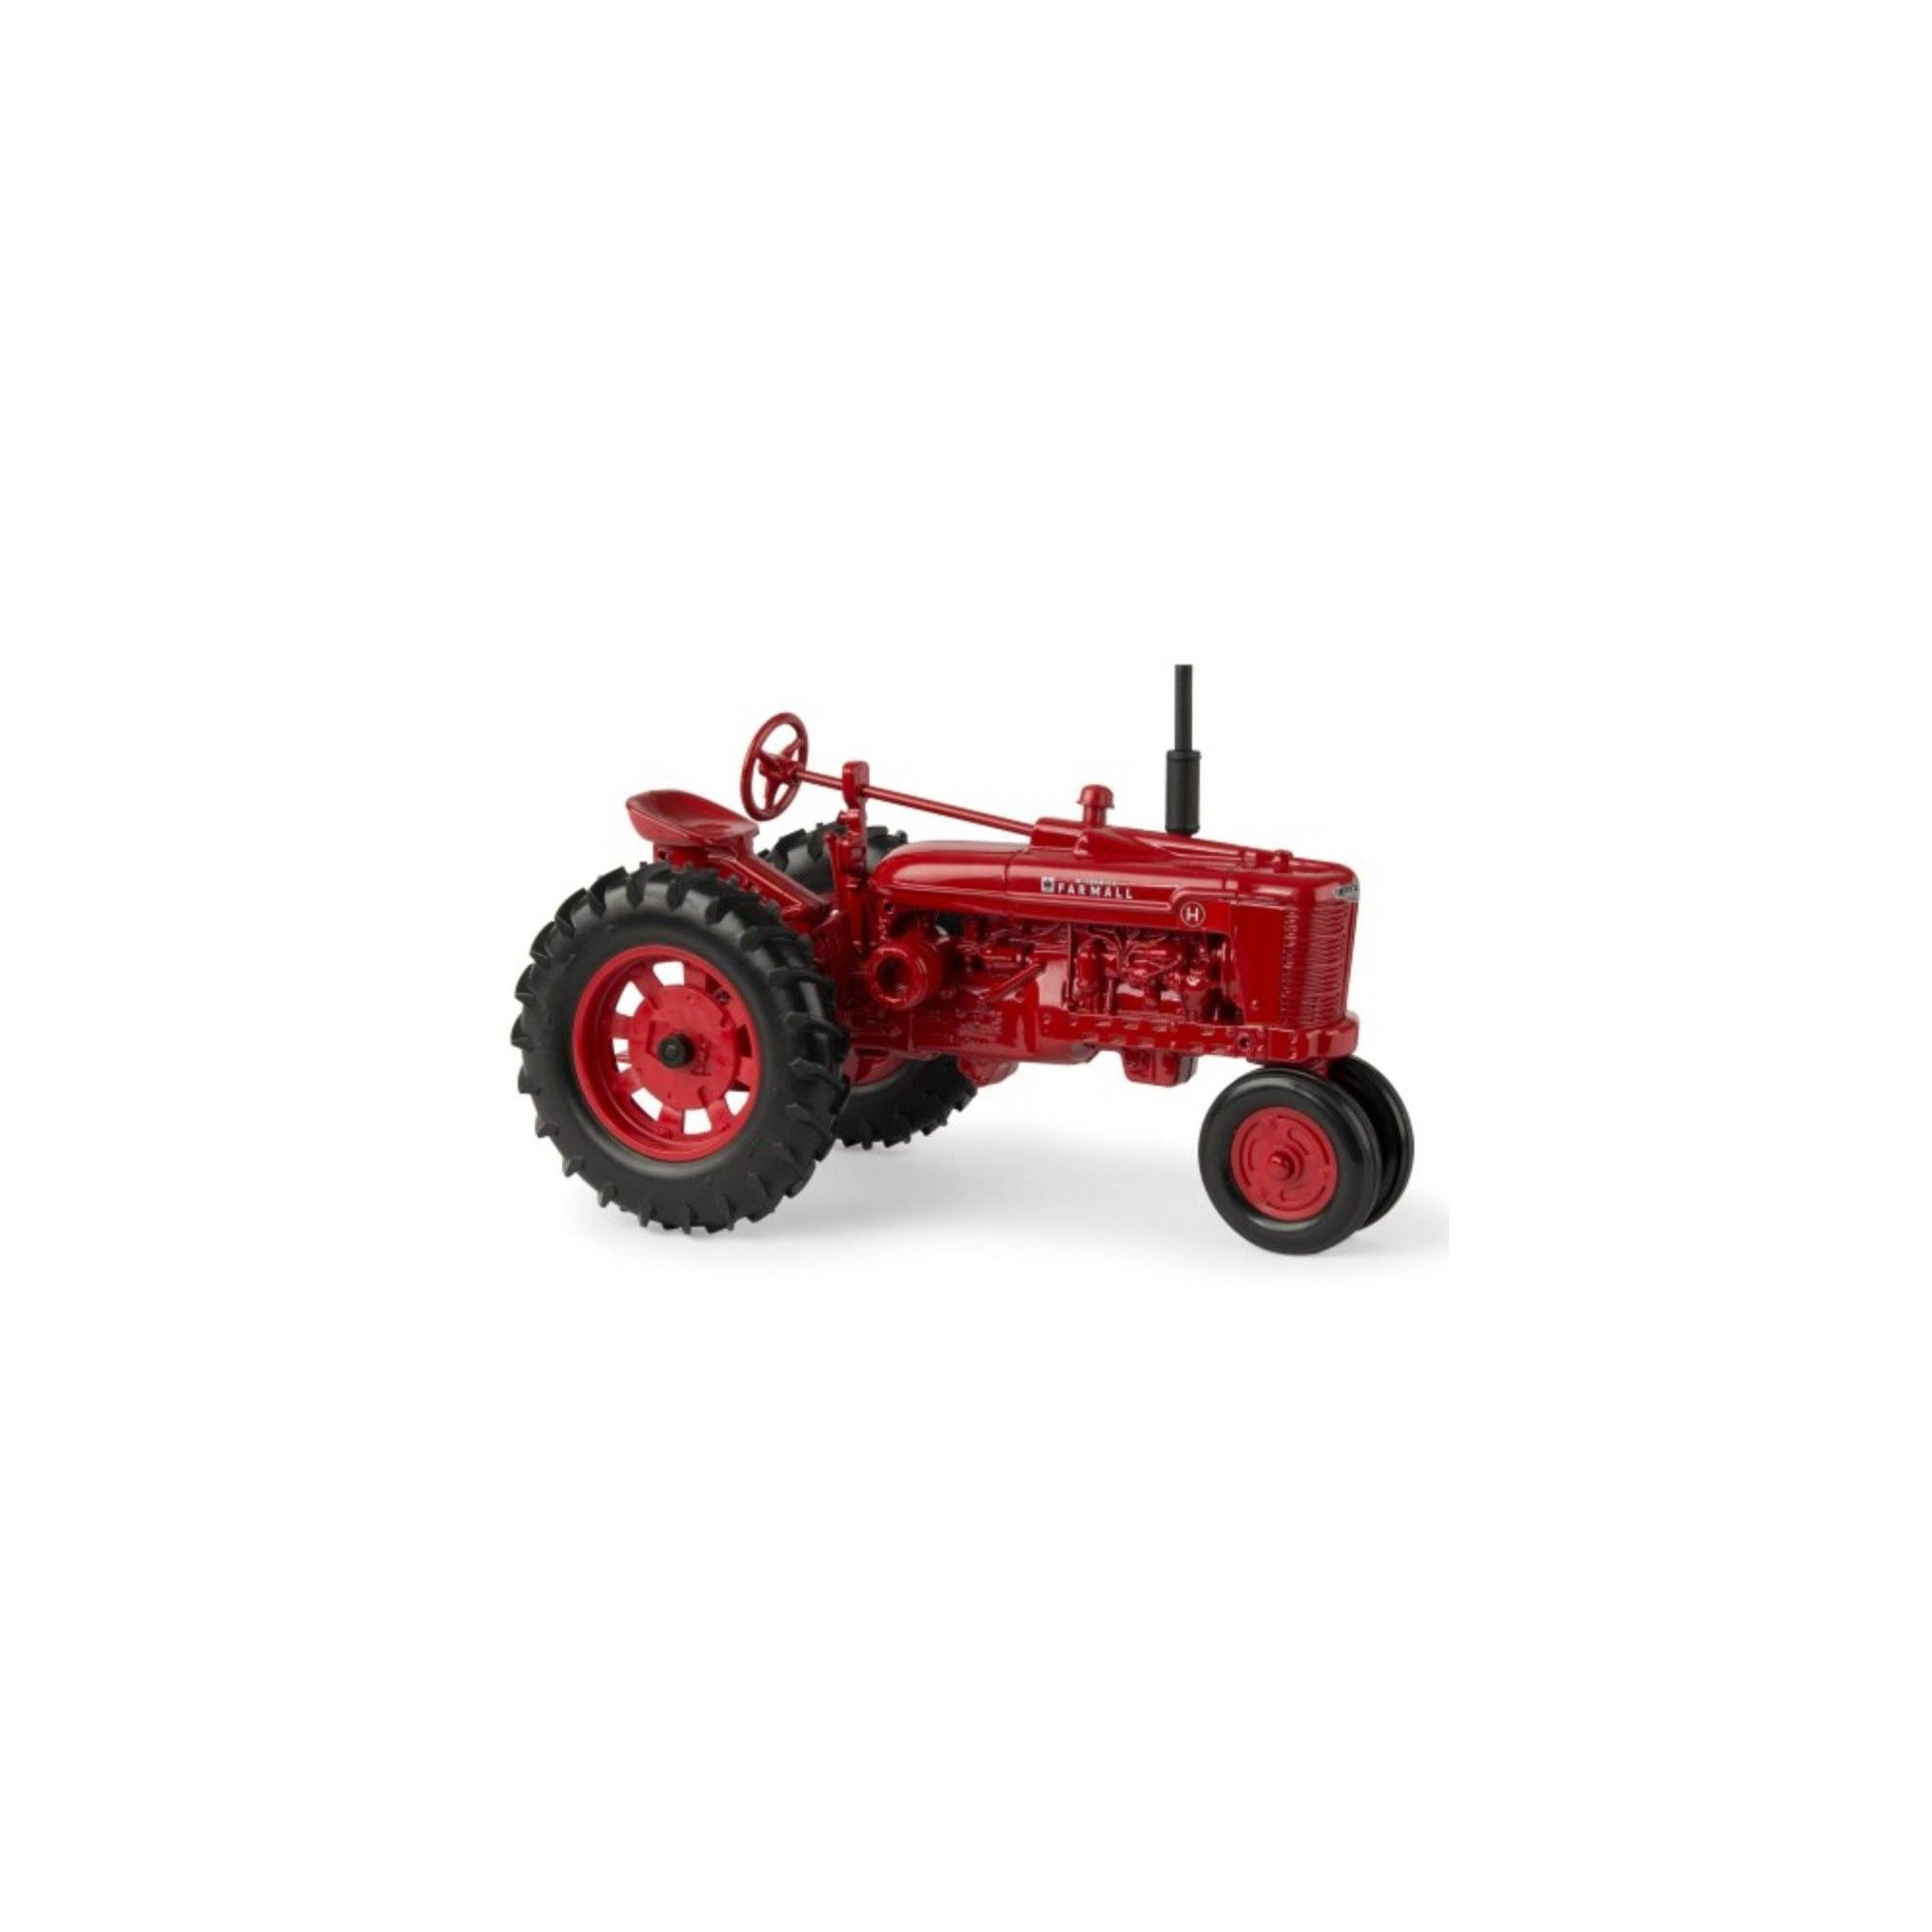 1//16 ORIGINAL tractor part Farmall steering wheel